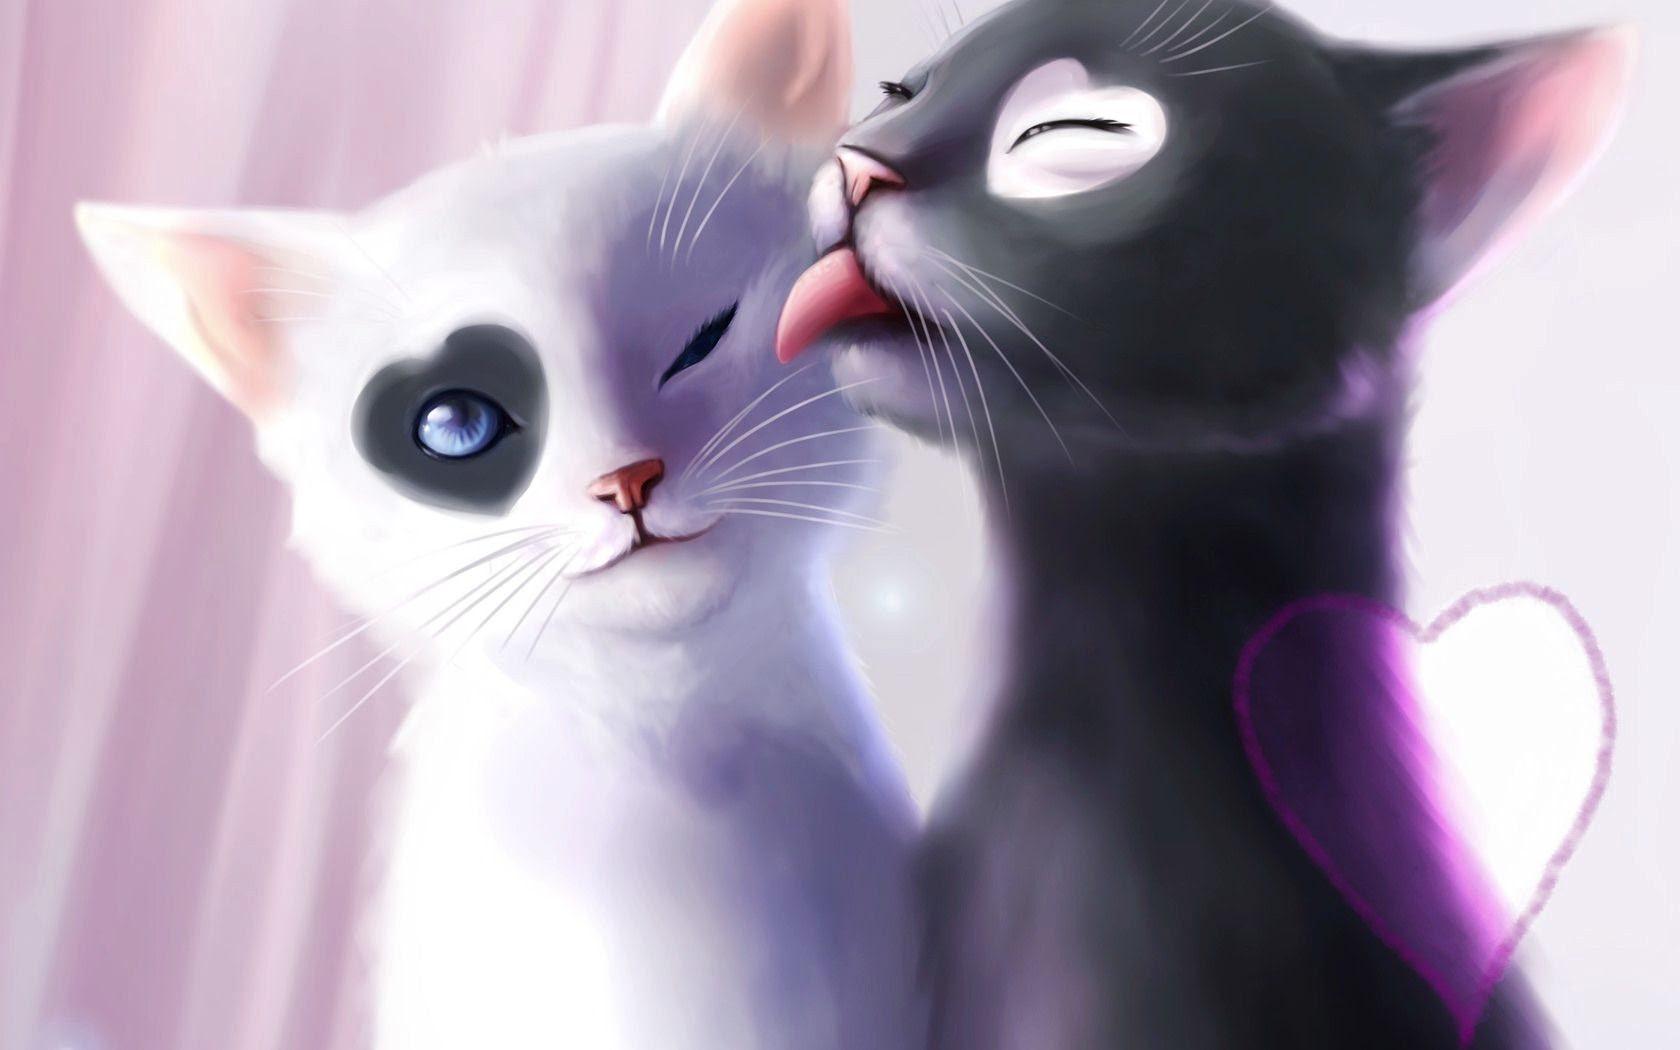 Anime Kitten HD Wallpaper 18636 - Baltana